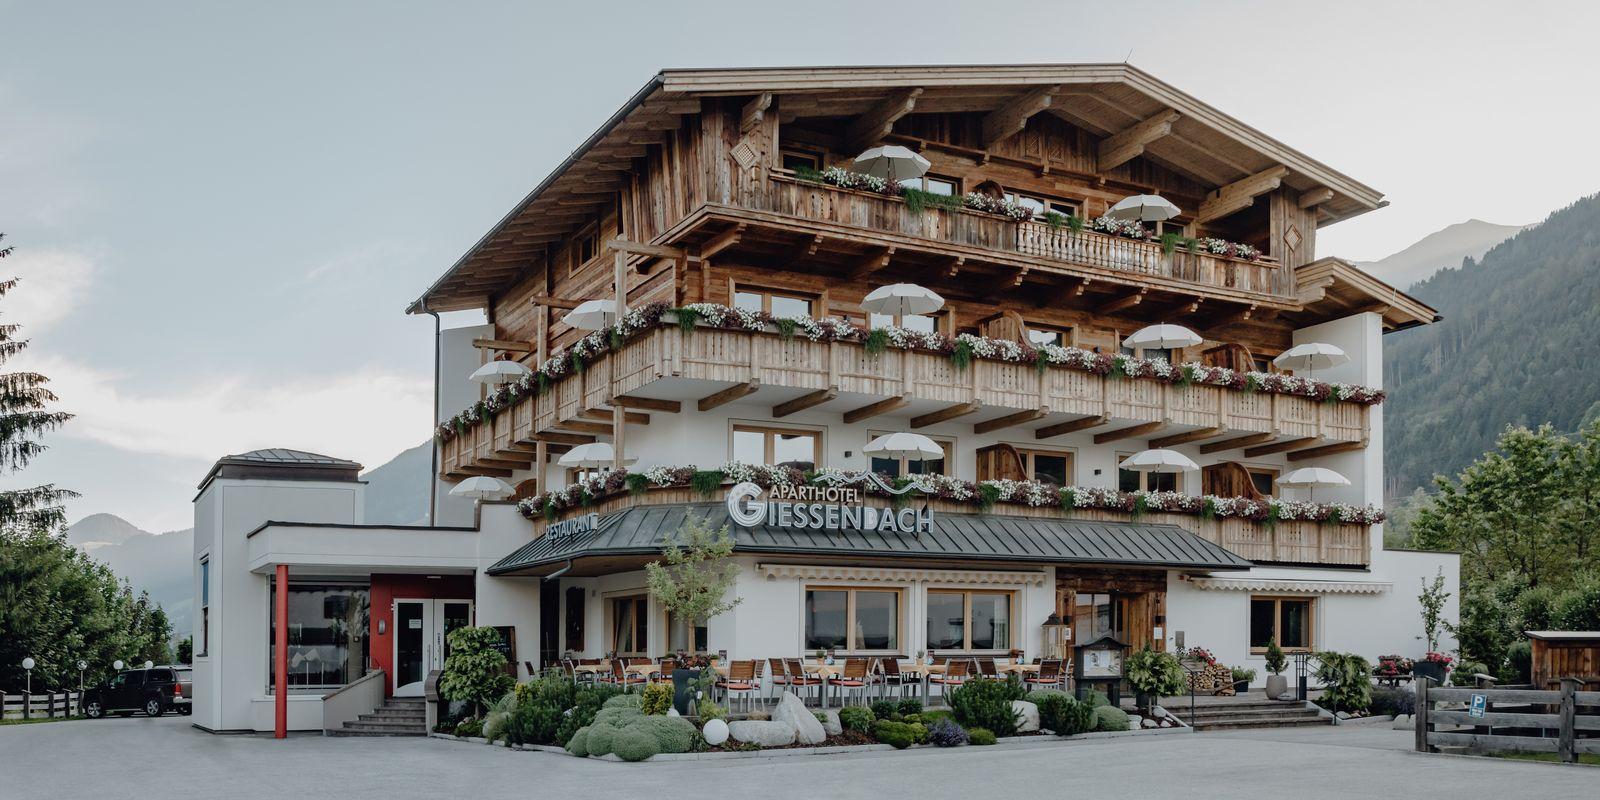 Eingang Giessenbach